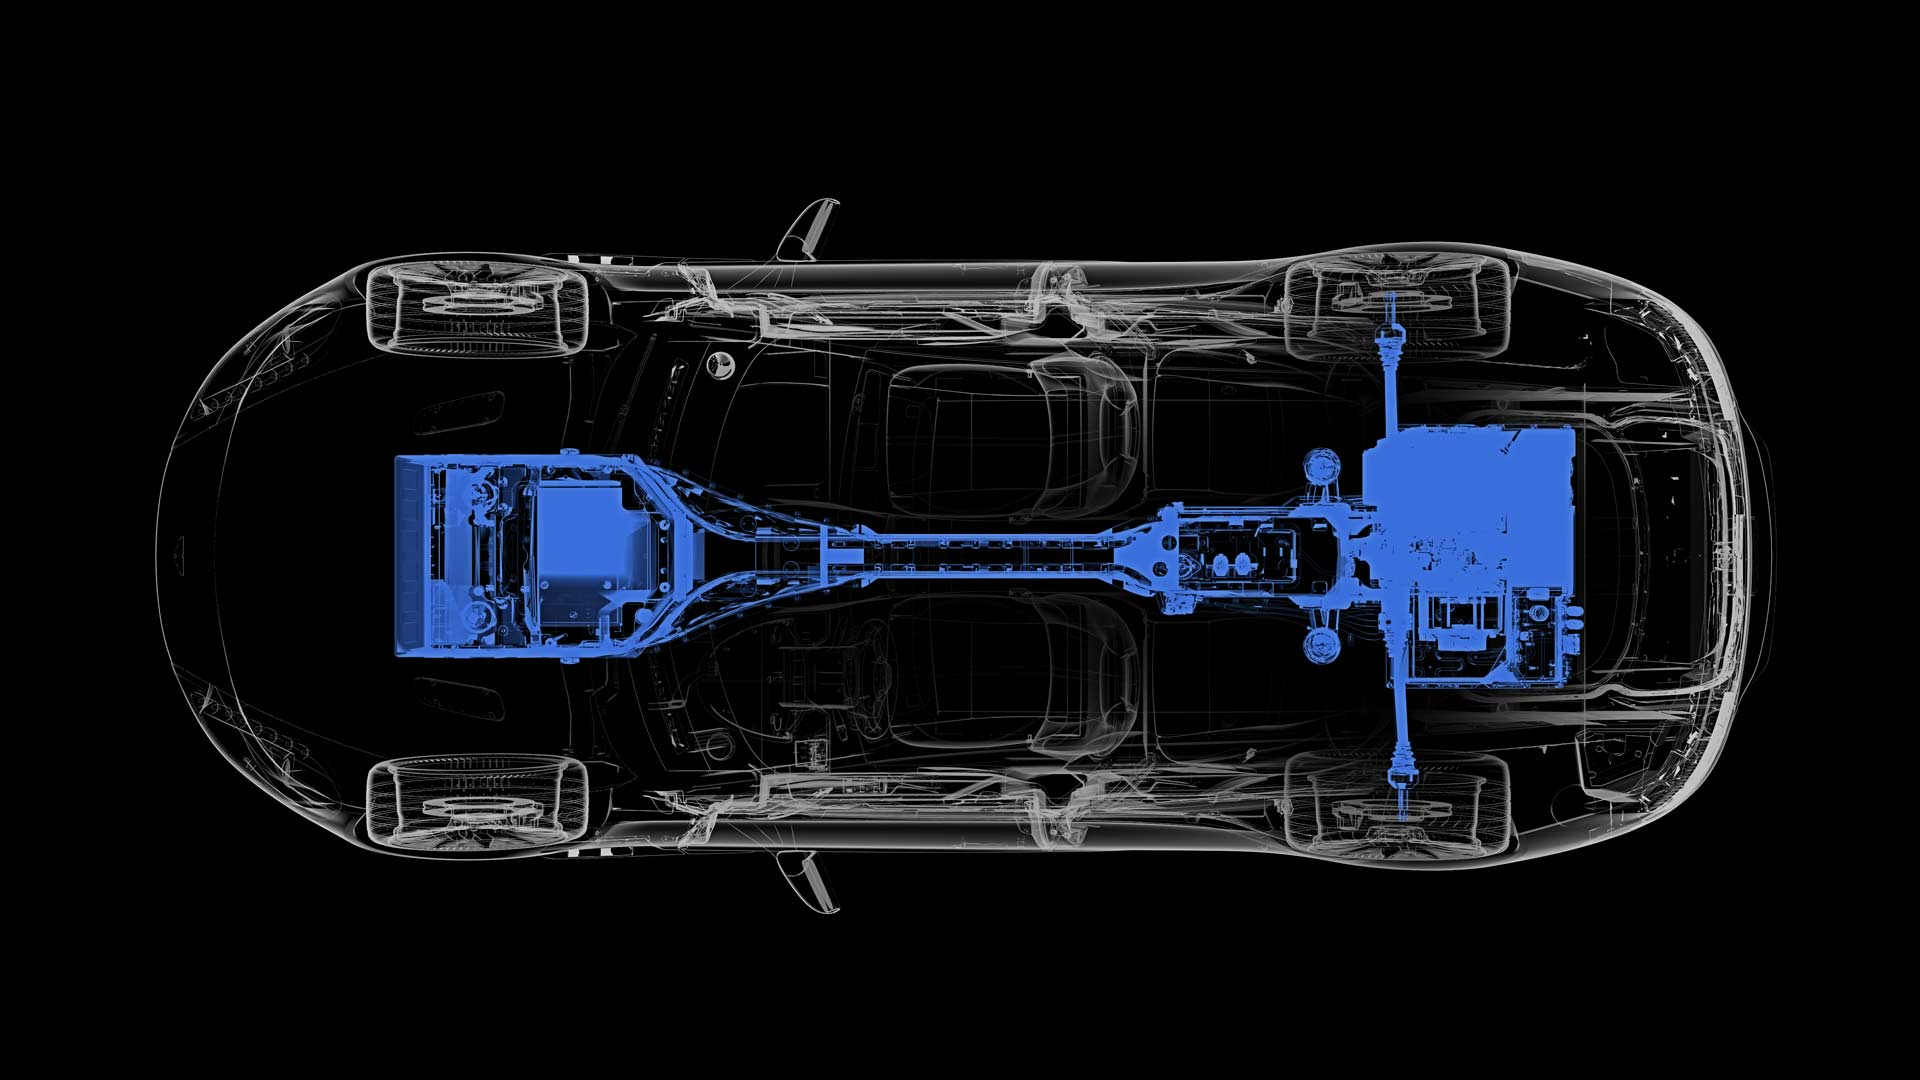 Aston Martin Rapide E electric vehicle powertrain